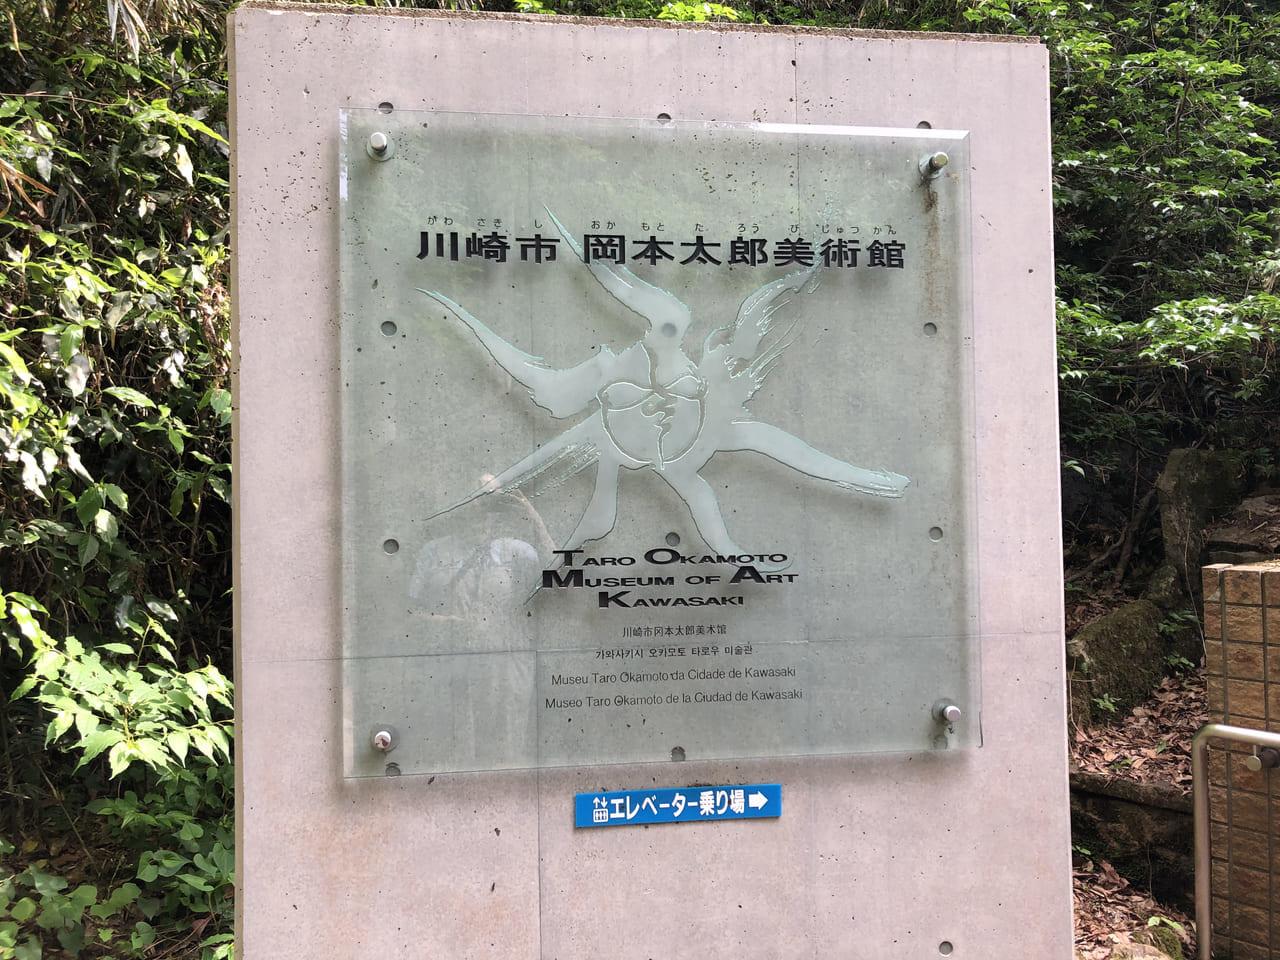 okamototarobijyutsukan/museum